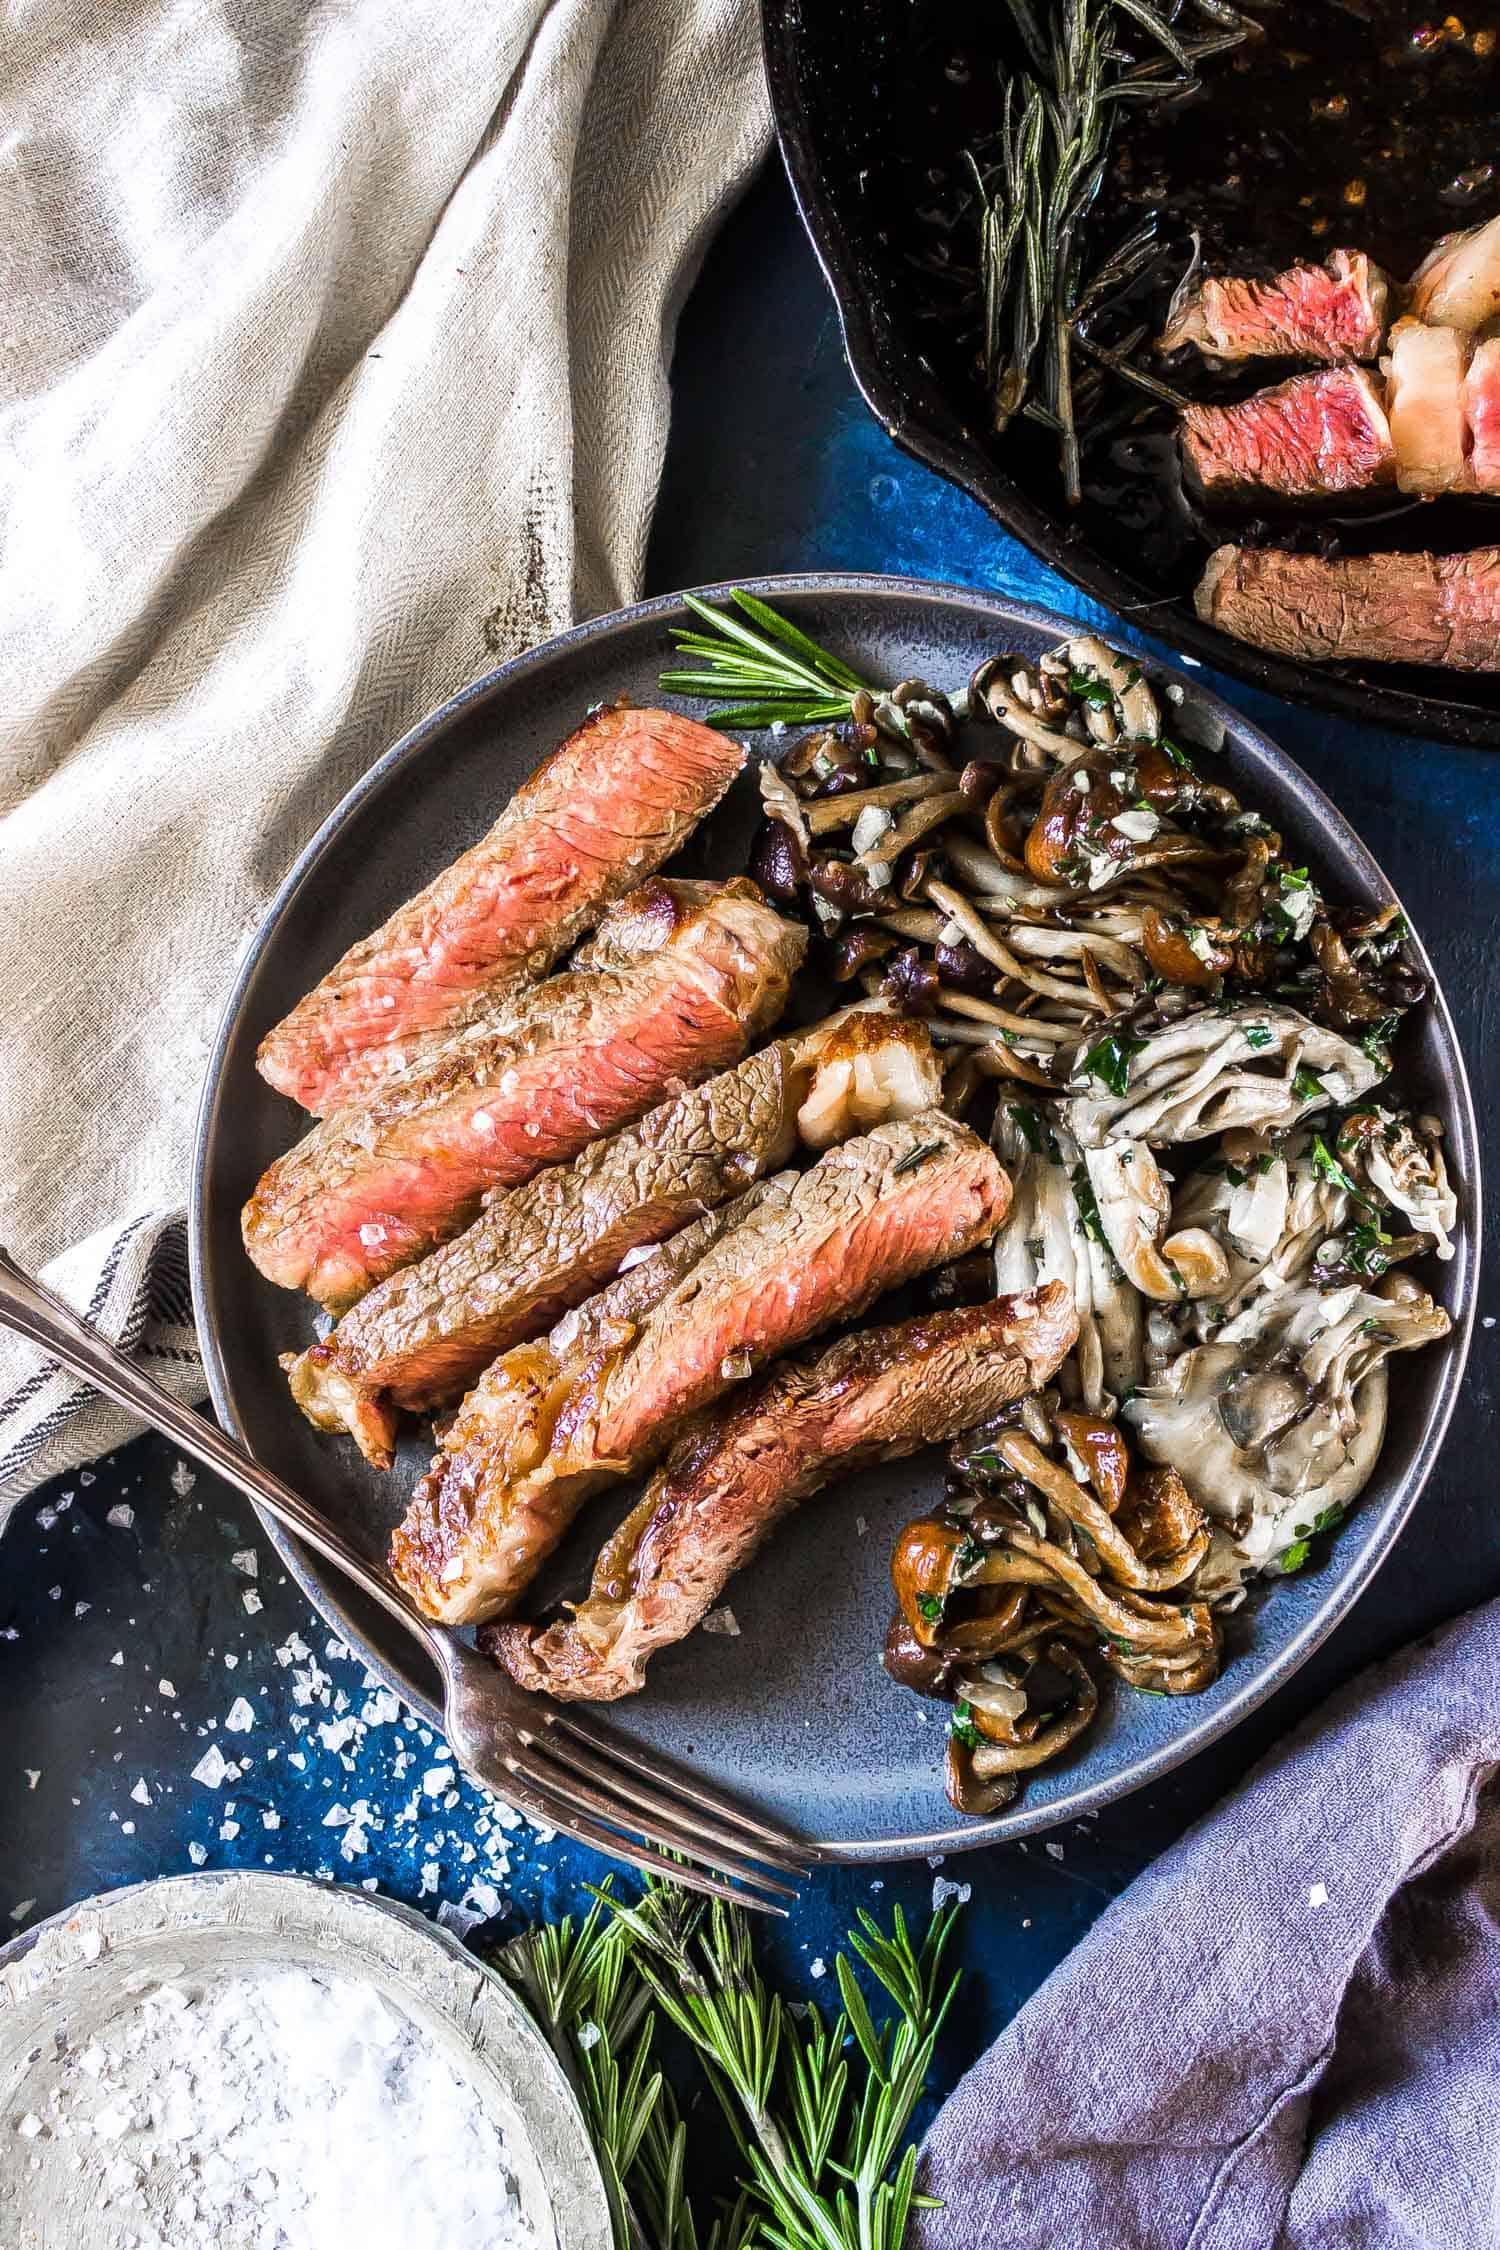 Cast Iron Steak on a plate with Garlic Butter Mushrooms